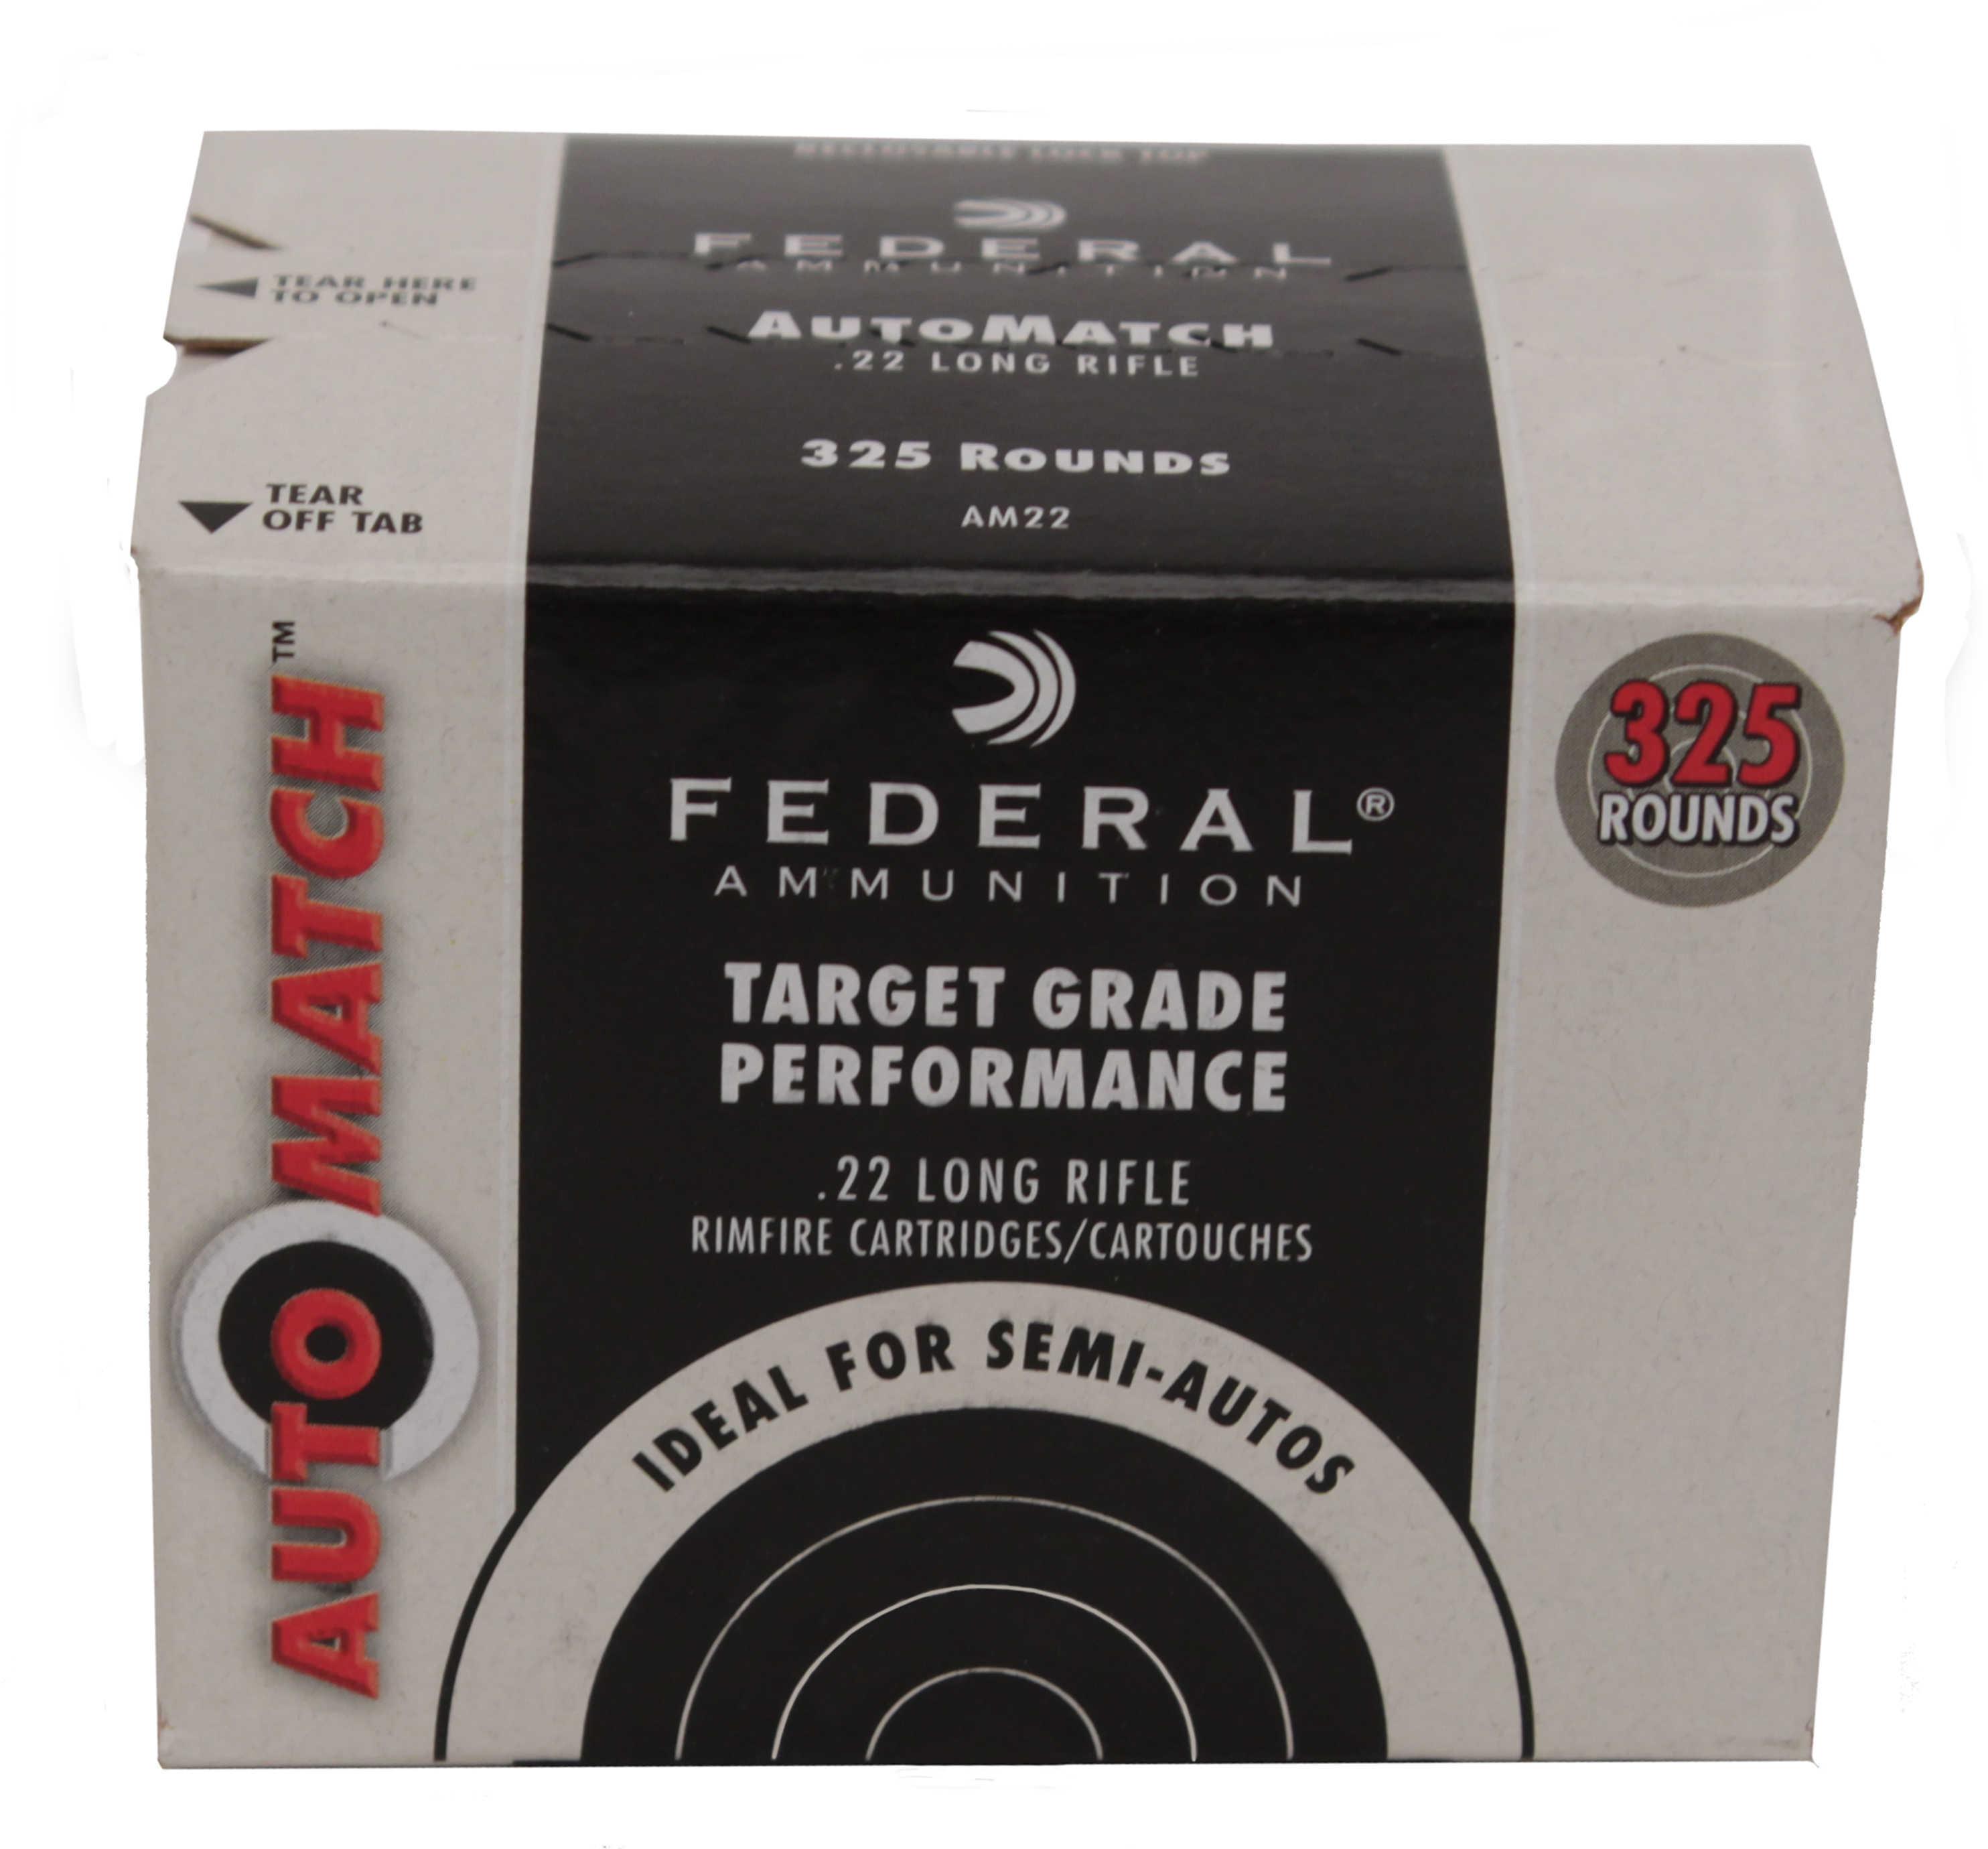 Federal AM22 Champion Training 22 LR 40 GR Lead Round Nose (LDRN) 325 Box